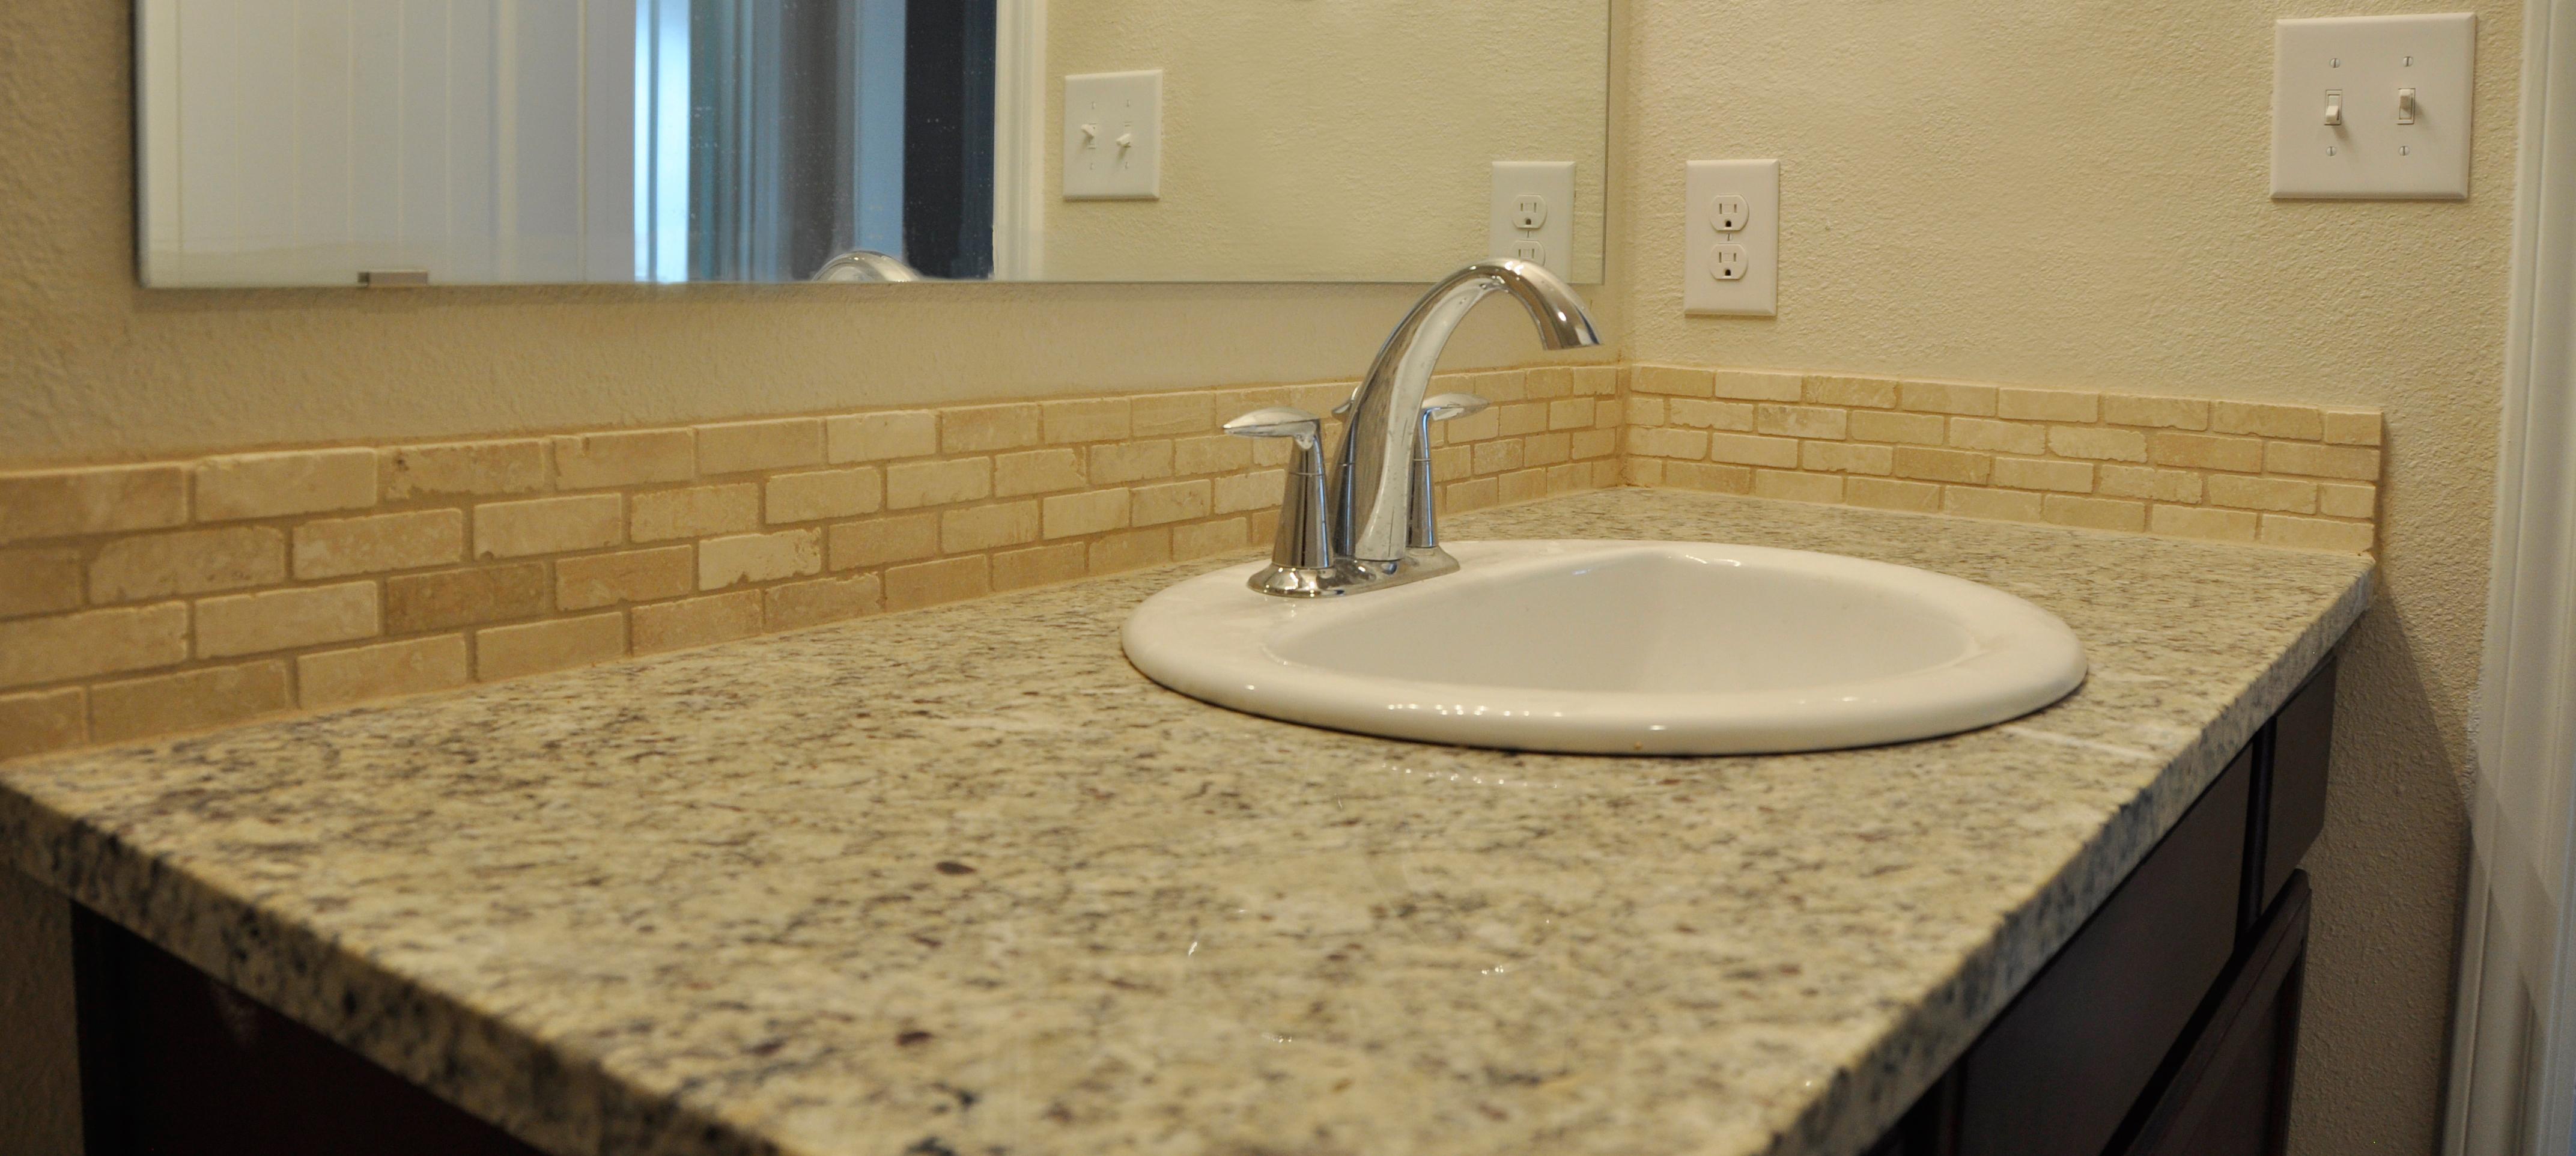 Betenbough homes new backsplash option house made home for Travertine bathroom countertops